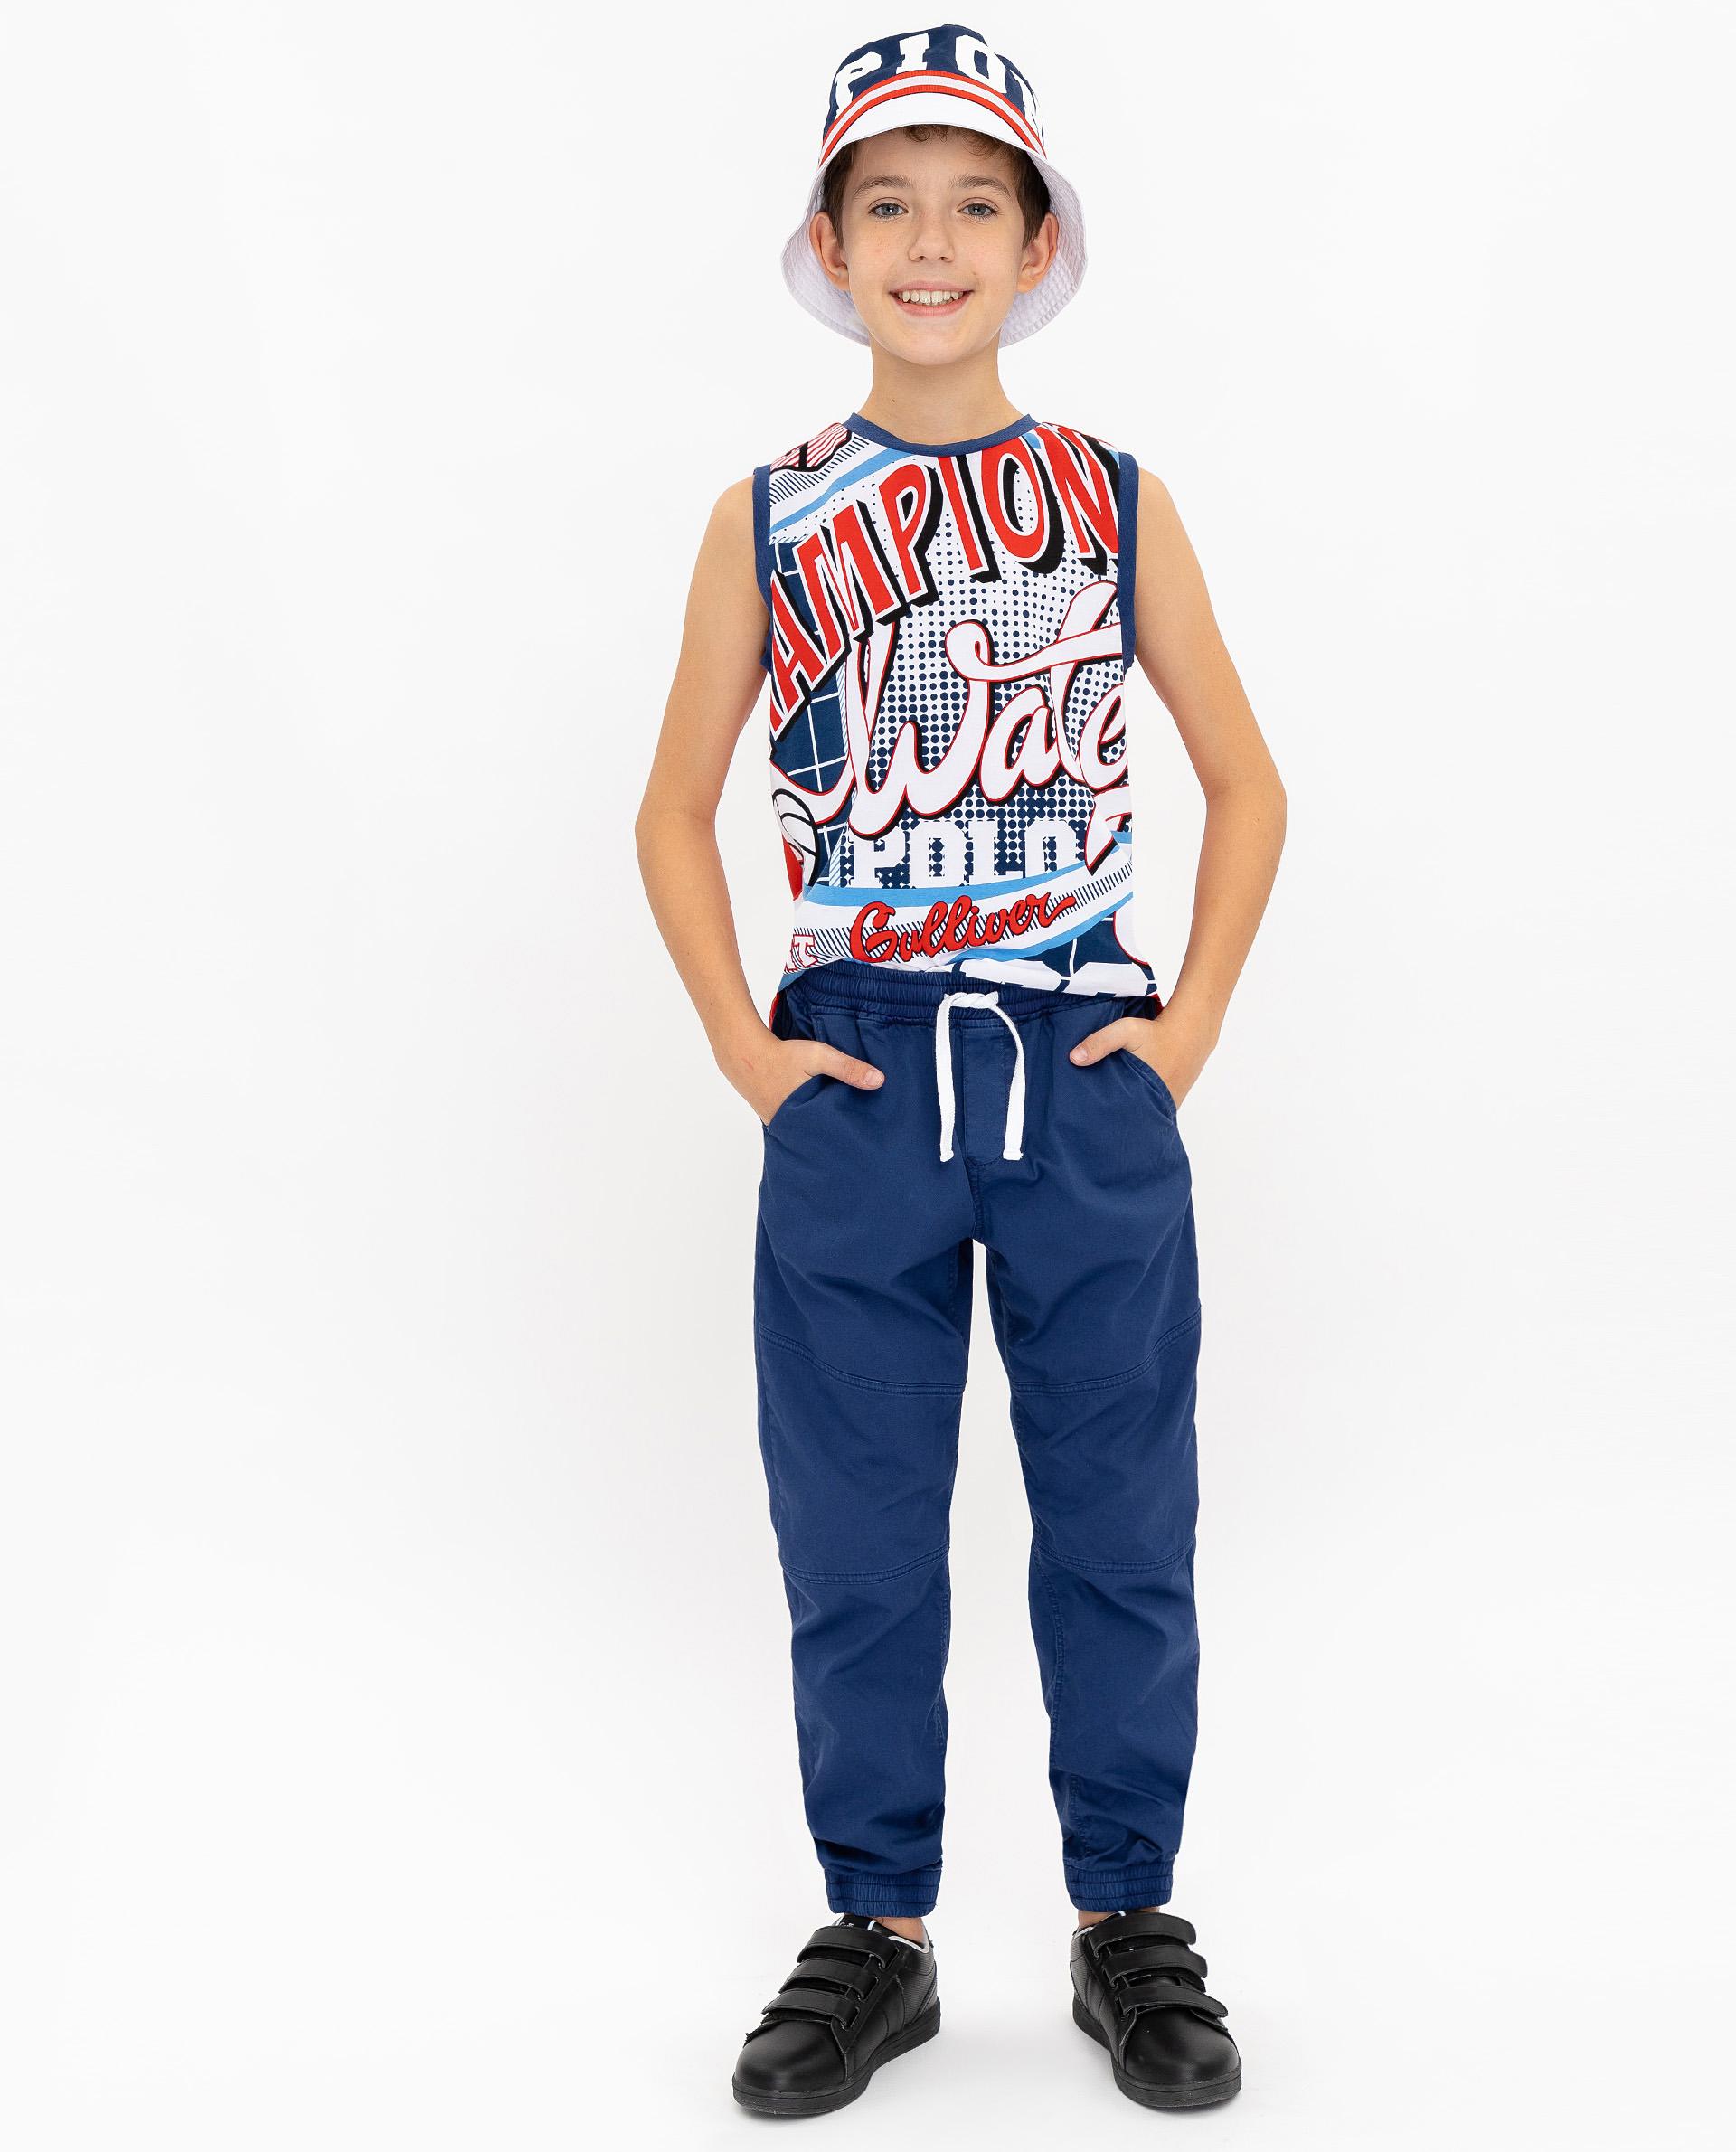 Купить 12012BJC6307, Синие брюки Gulliver, синий, 146, Мужской, ВЕСНА/ЛЕТО 2020 (shop: GulliverMarket Gulliver Market)